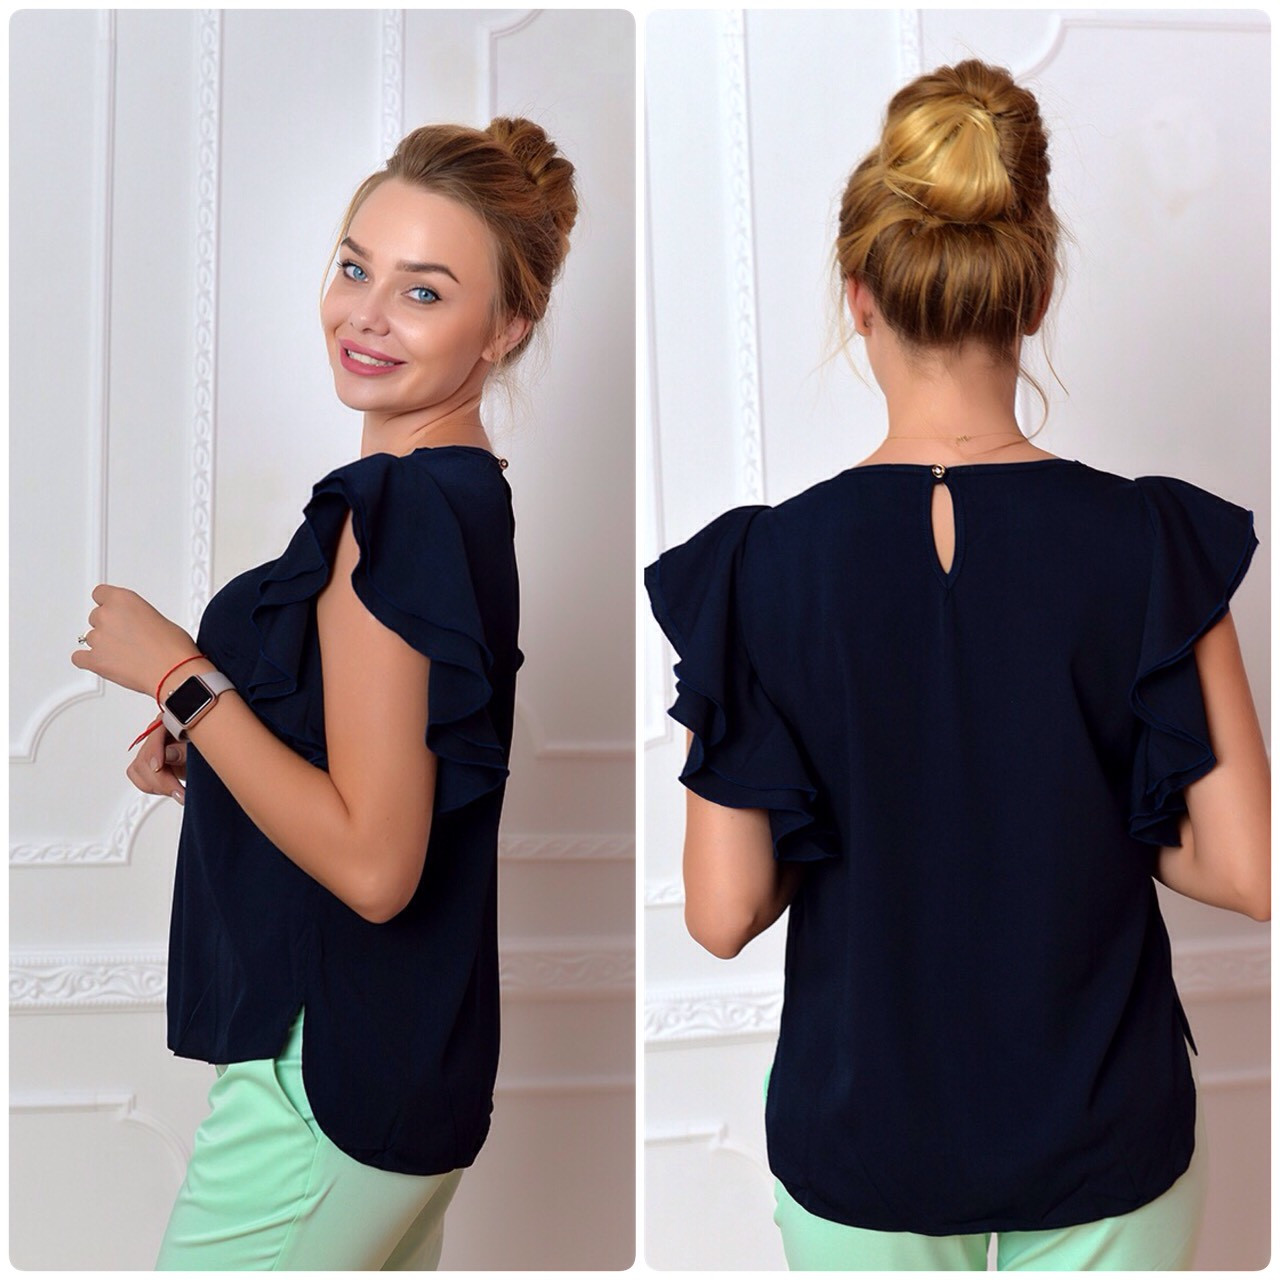 Блузка нарядная, модель 902, темно синий